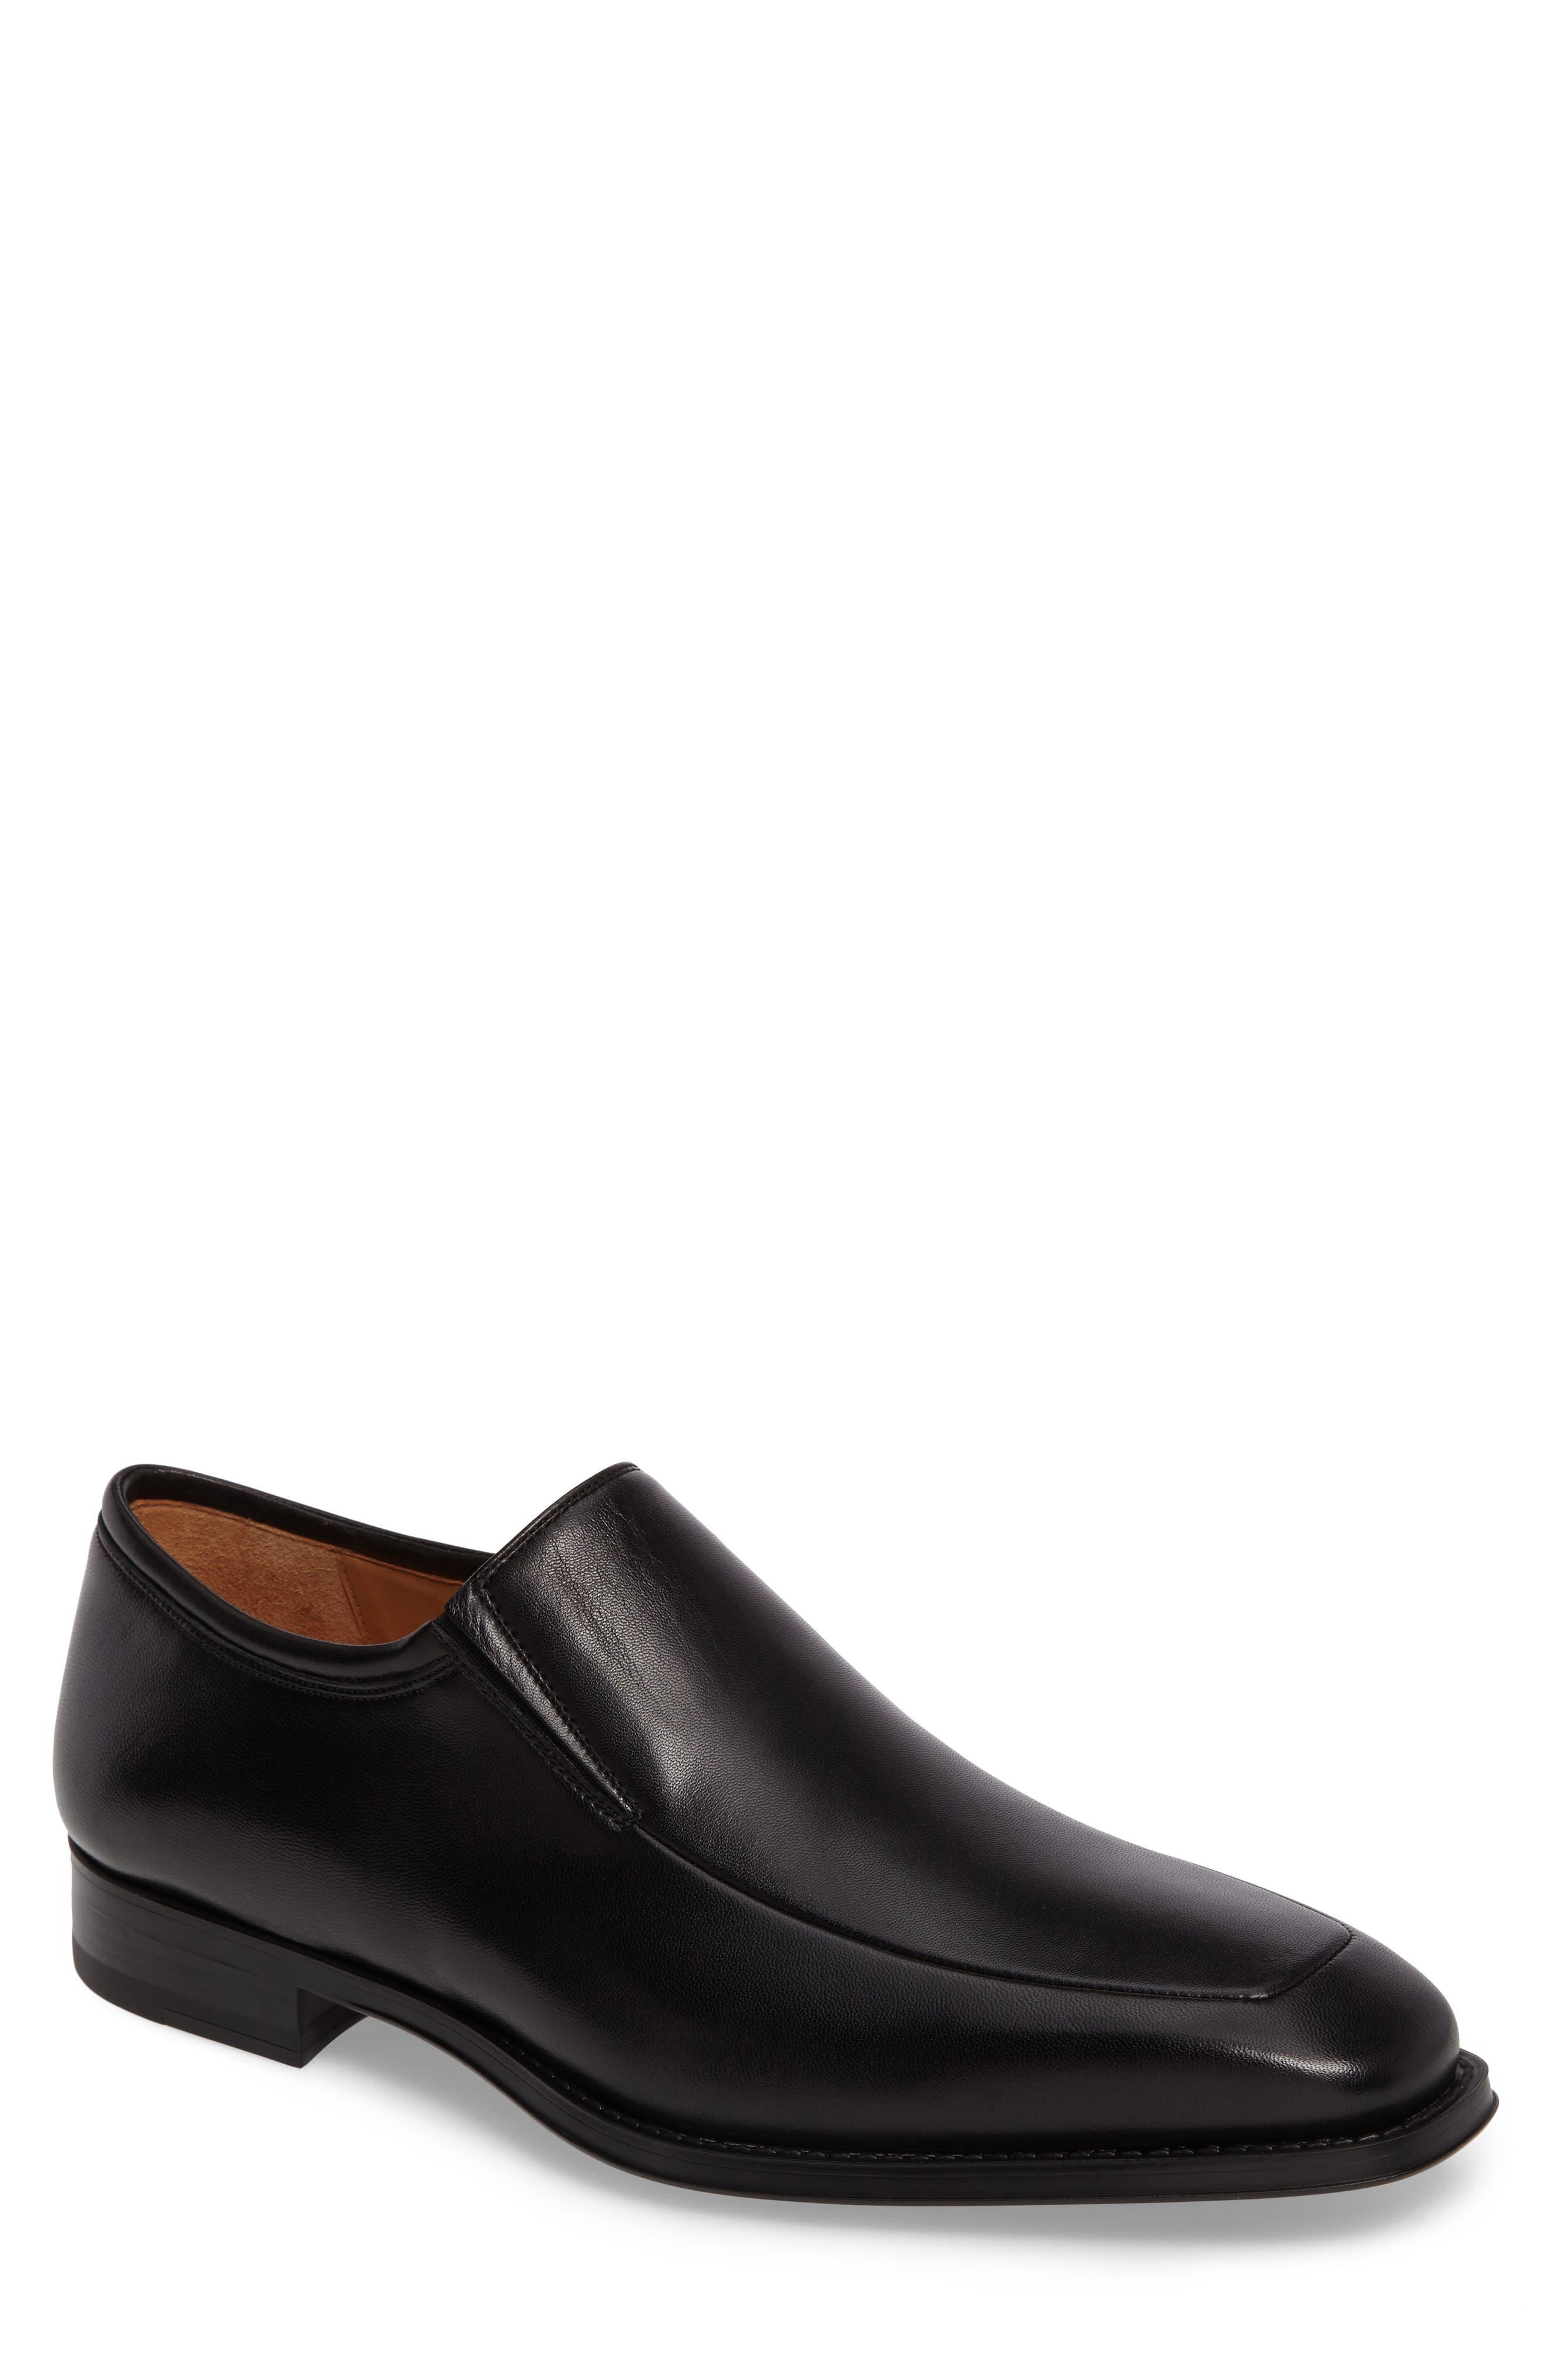 'Dominguez' Slip-On,                         Main,                         color, Black